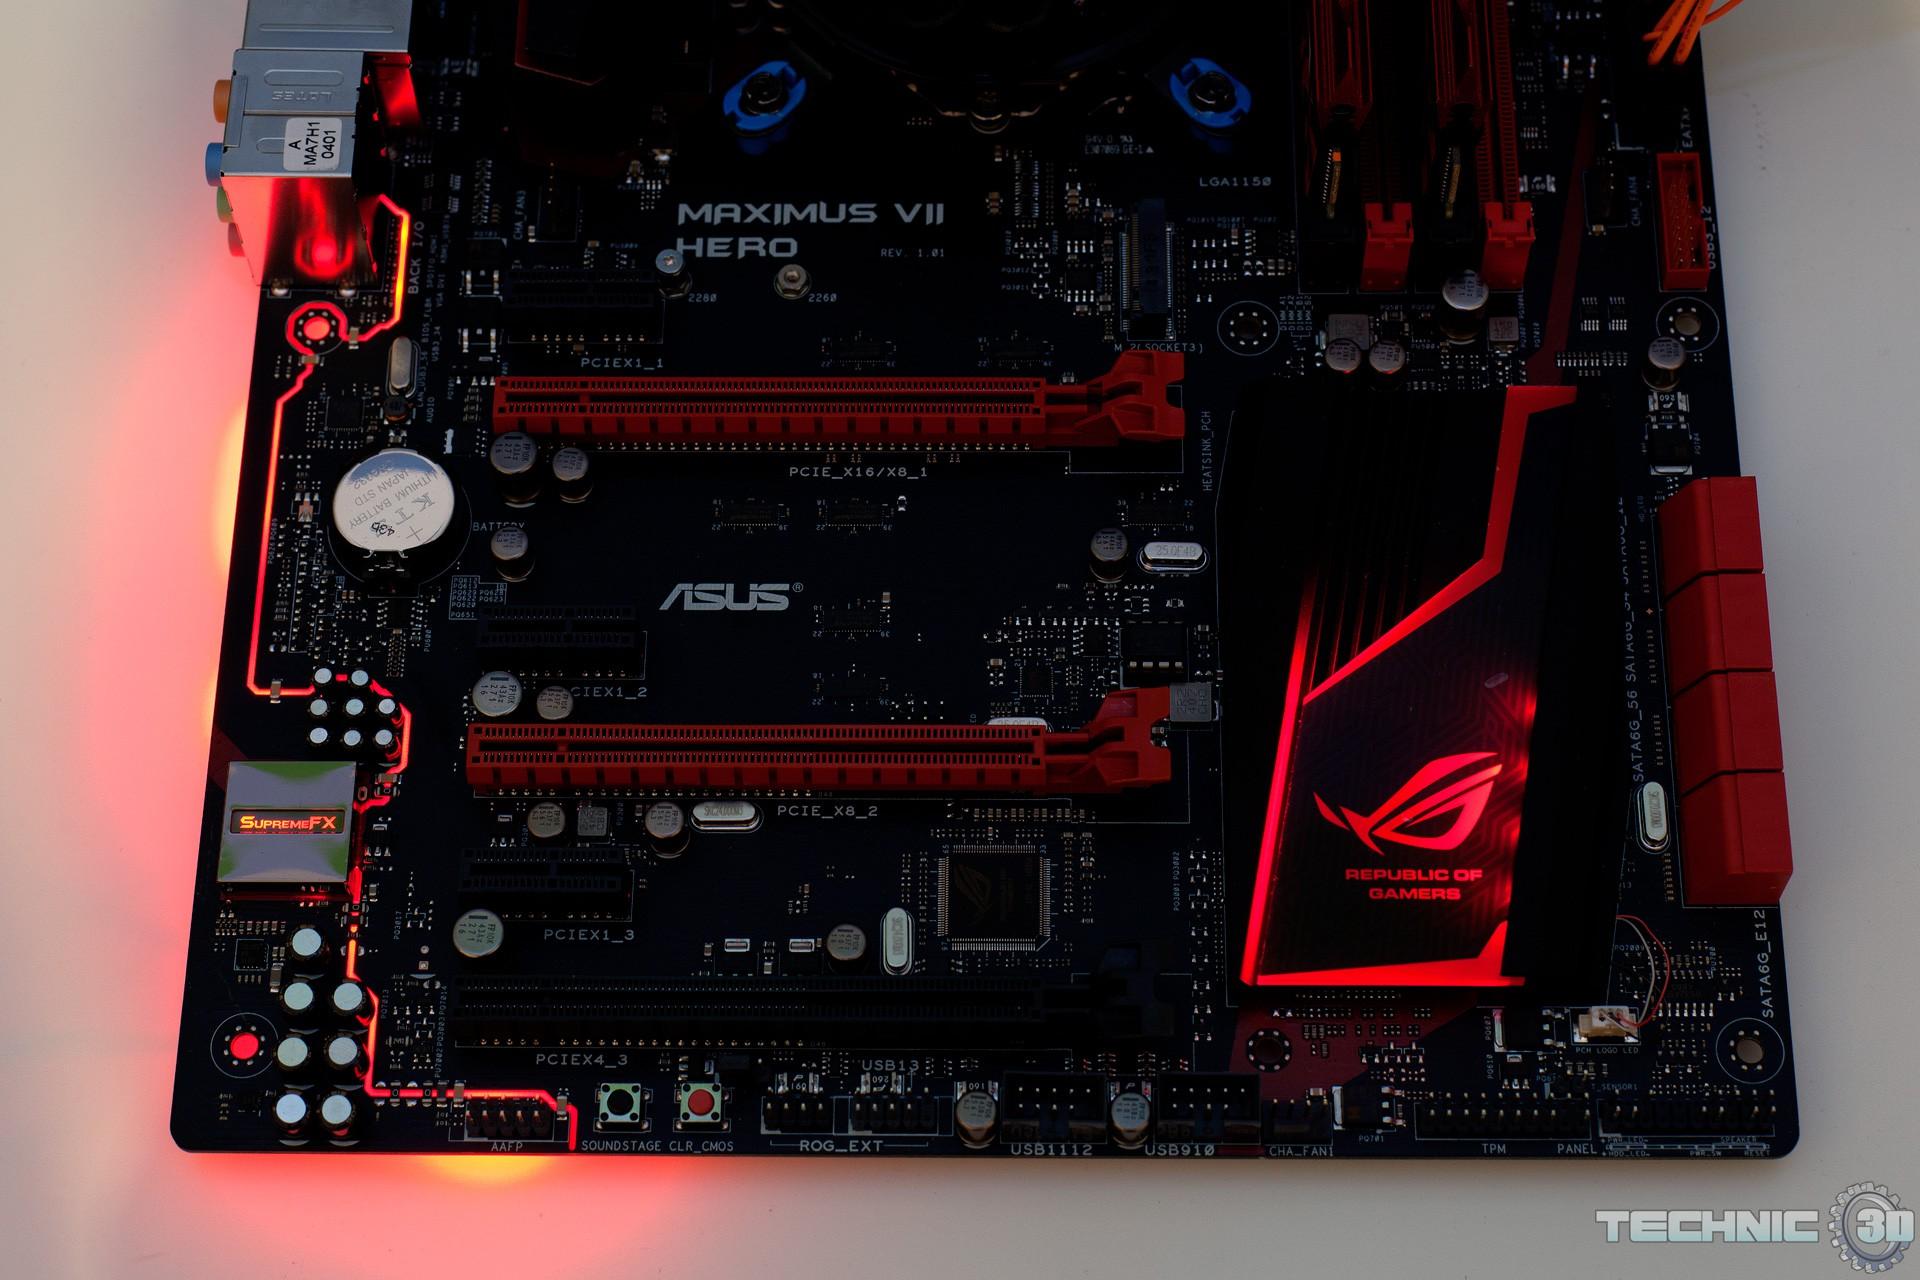 Gigabyte Z97XGaming 3 LGA 1150 Z97Chipset Motherboard